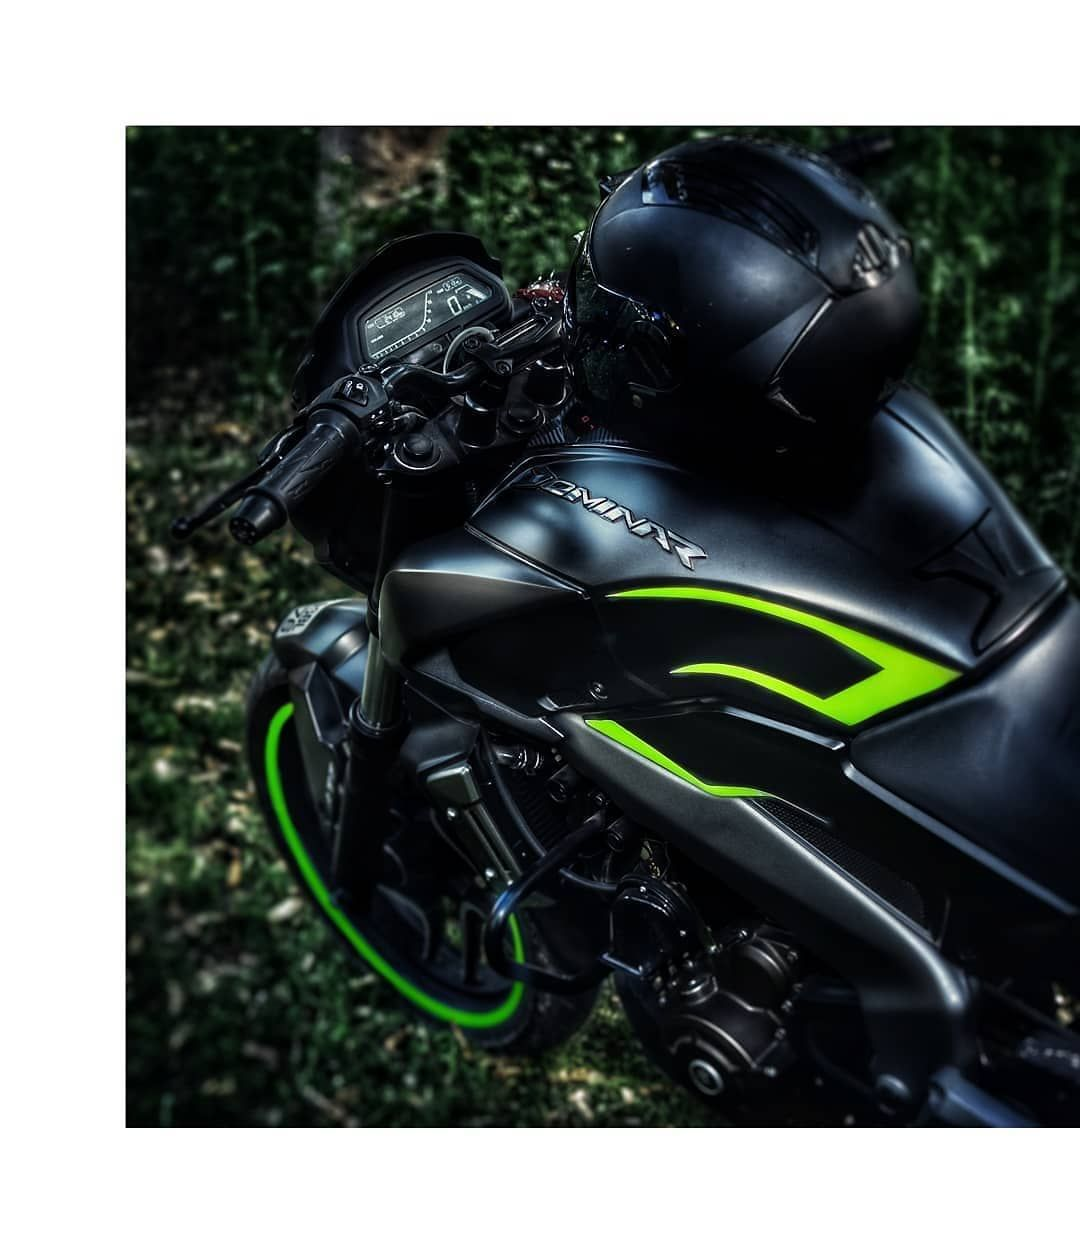 Super Bikes Image By Gerson Tafur Nieto On Motor Bike Stickers